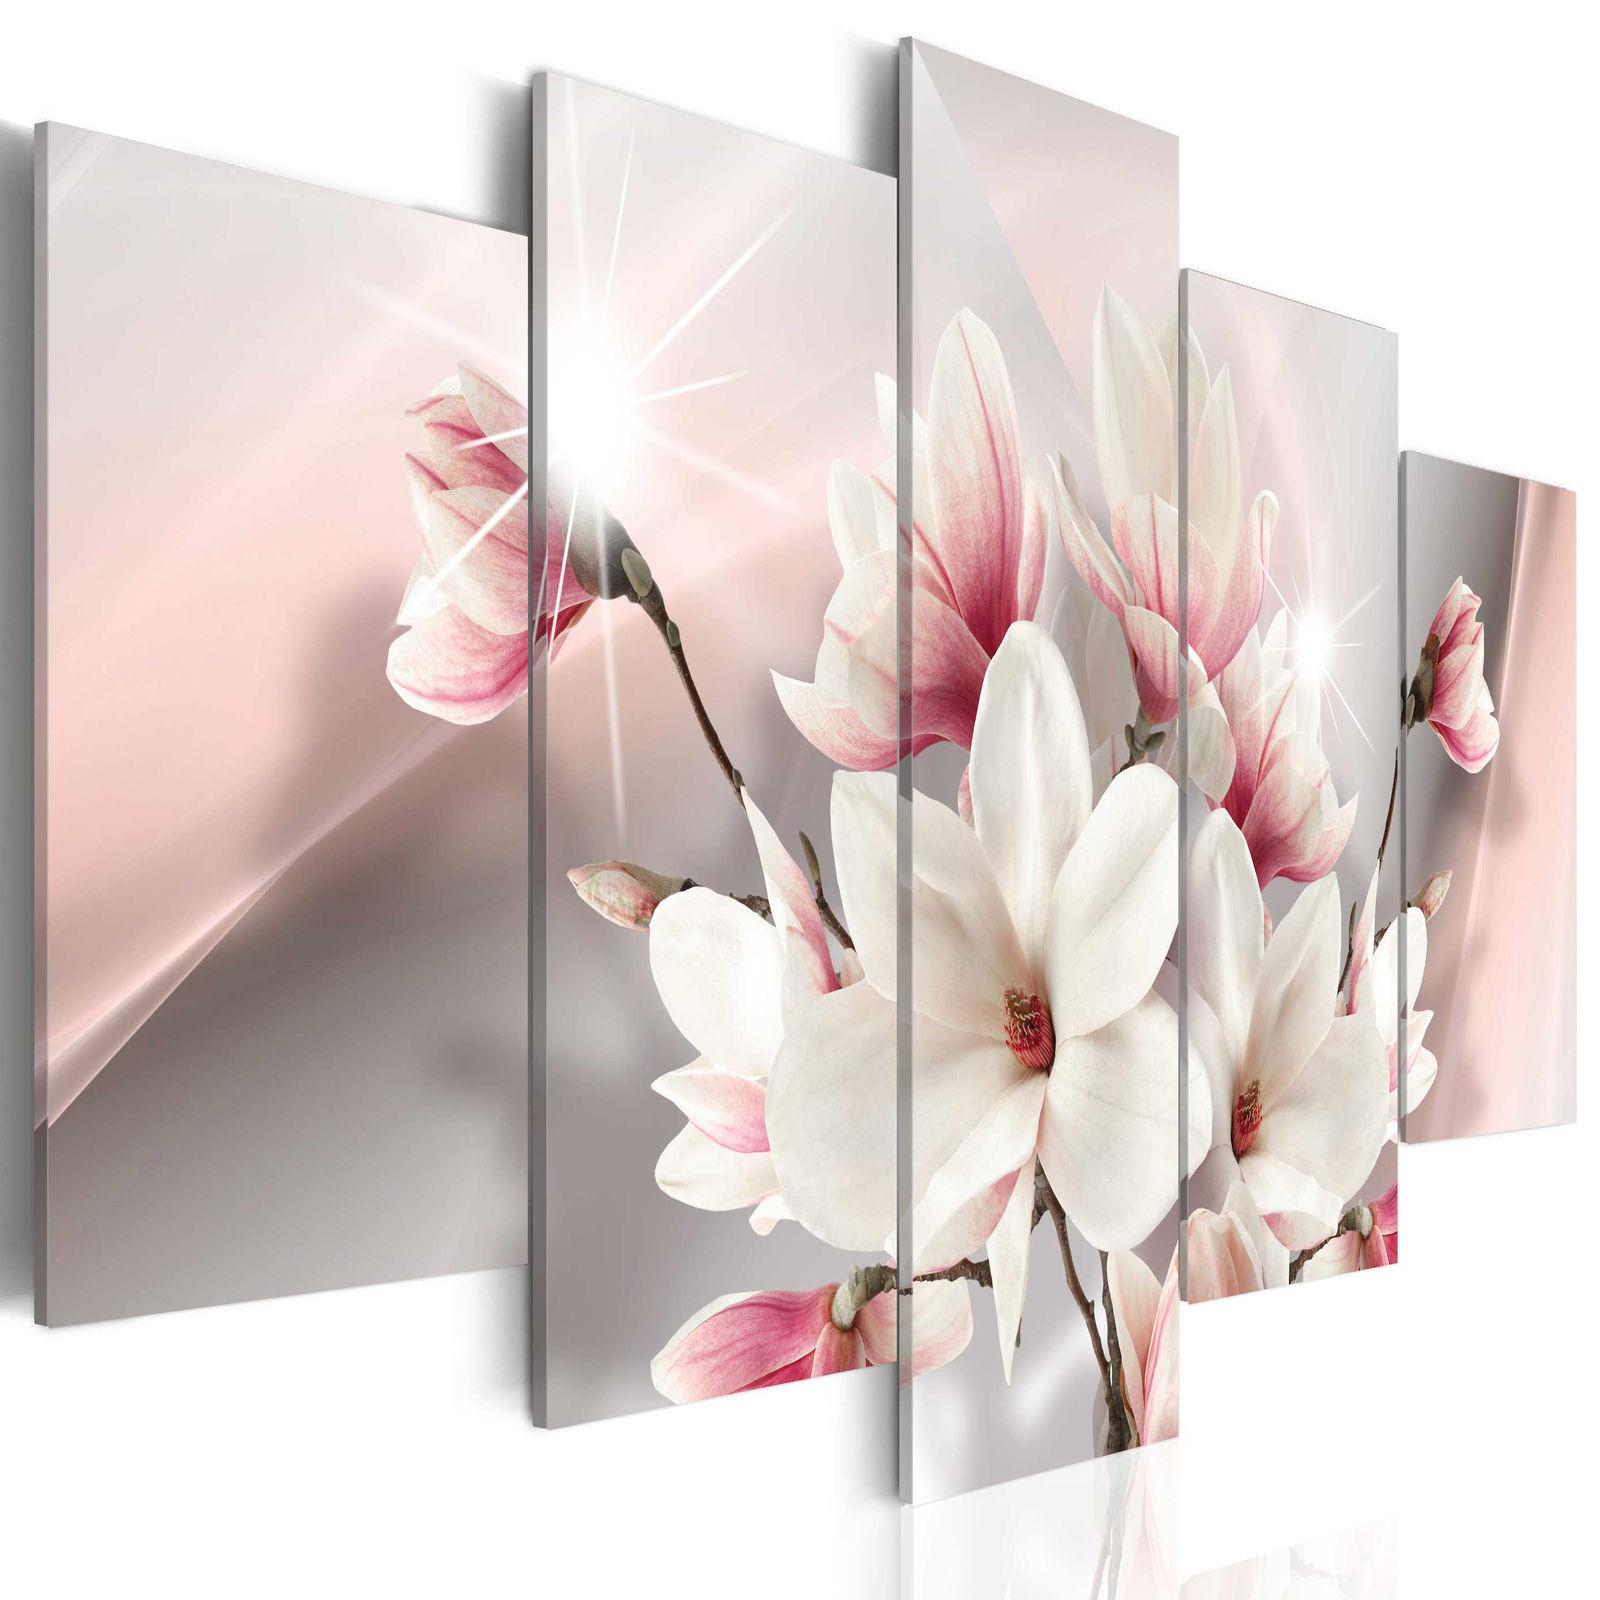 Leinwand Bilder Blumen Weiß Magnnolien Natur Akustikbild Wandbilder Xxl